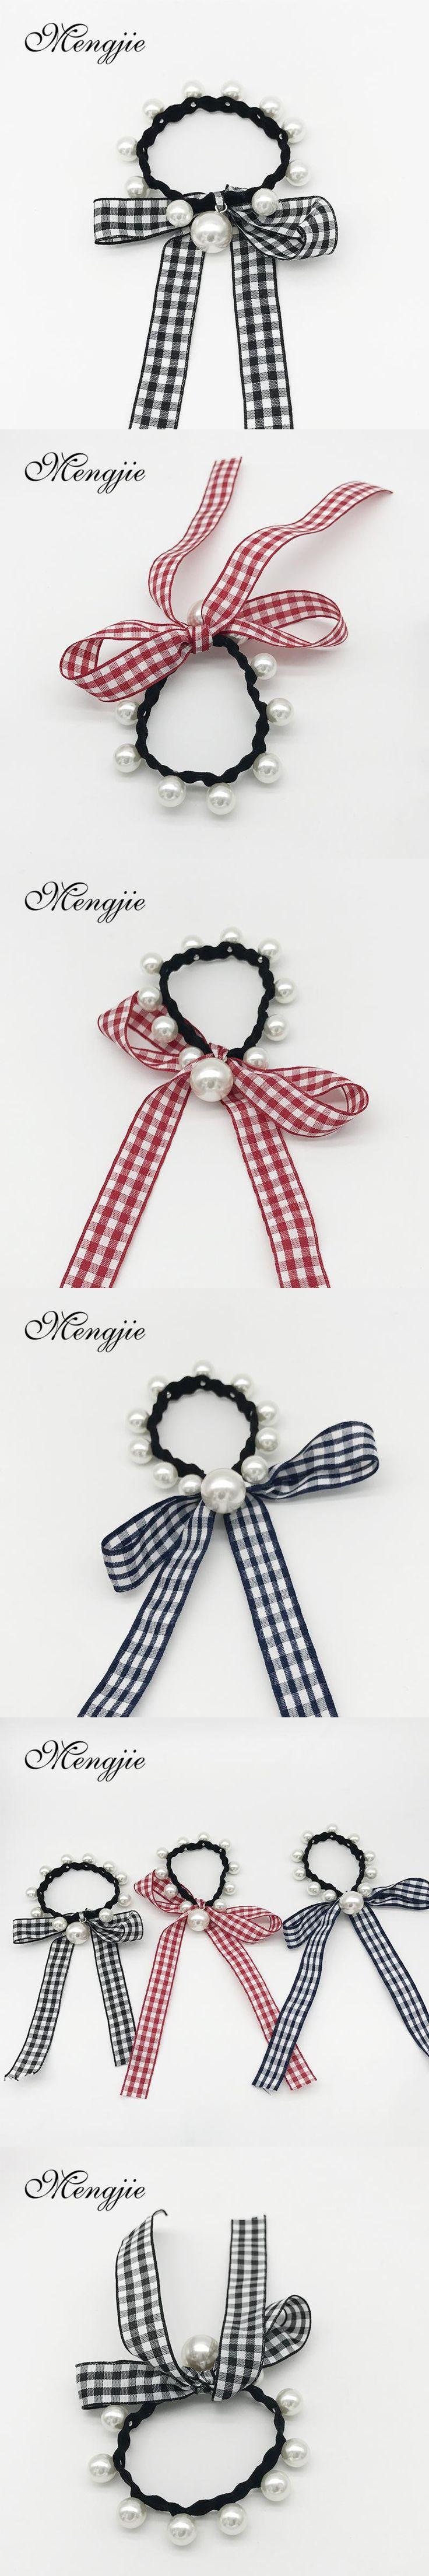 2017 elastic haar accessoires for women plaid ribbon imitation pearls hairband bowknot hair ornaments bandeau cheveux 5011